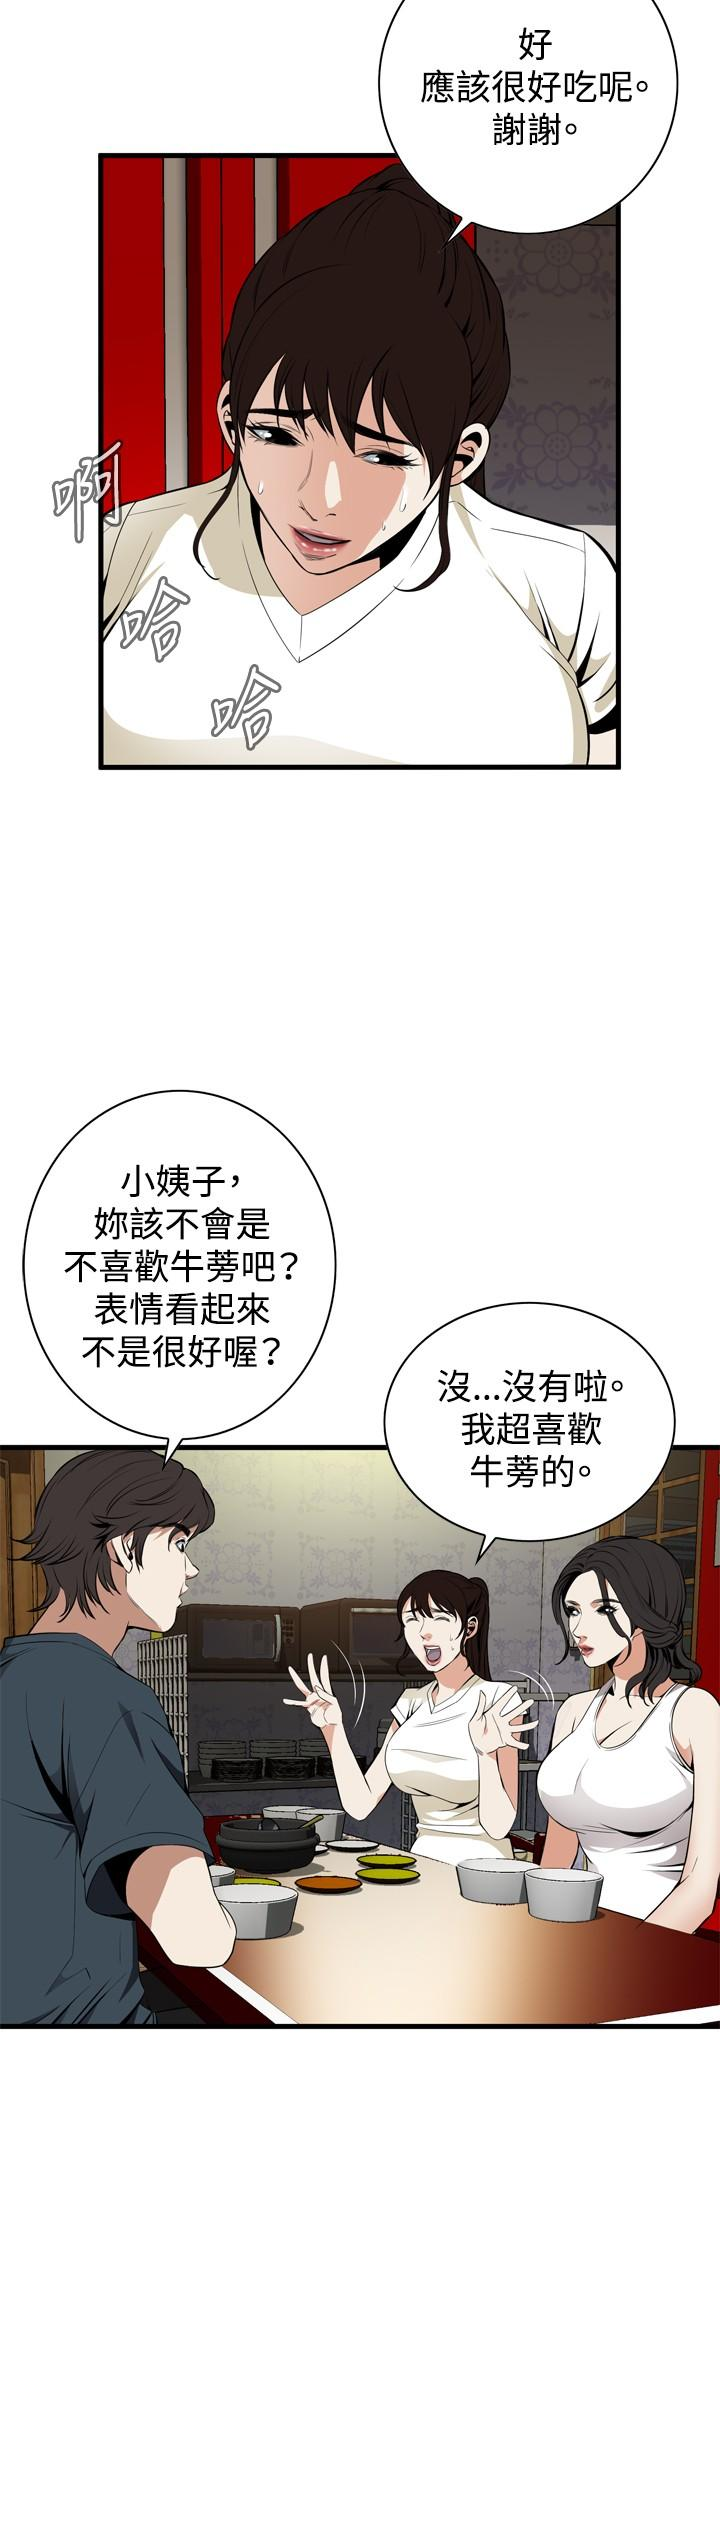 Take a Peek 偷窥 Ch.39~51 [Chinese]中文 139